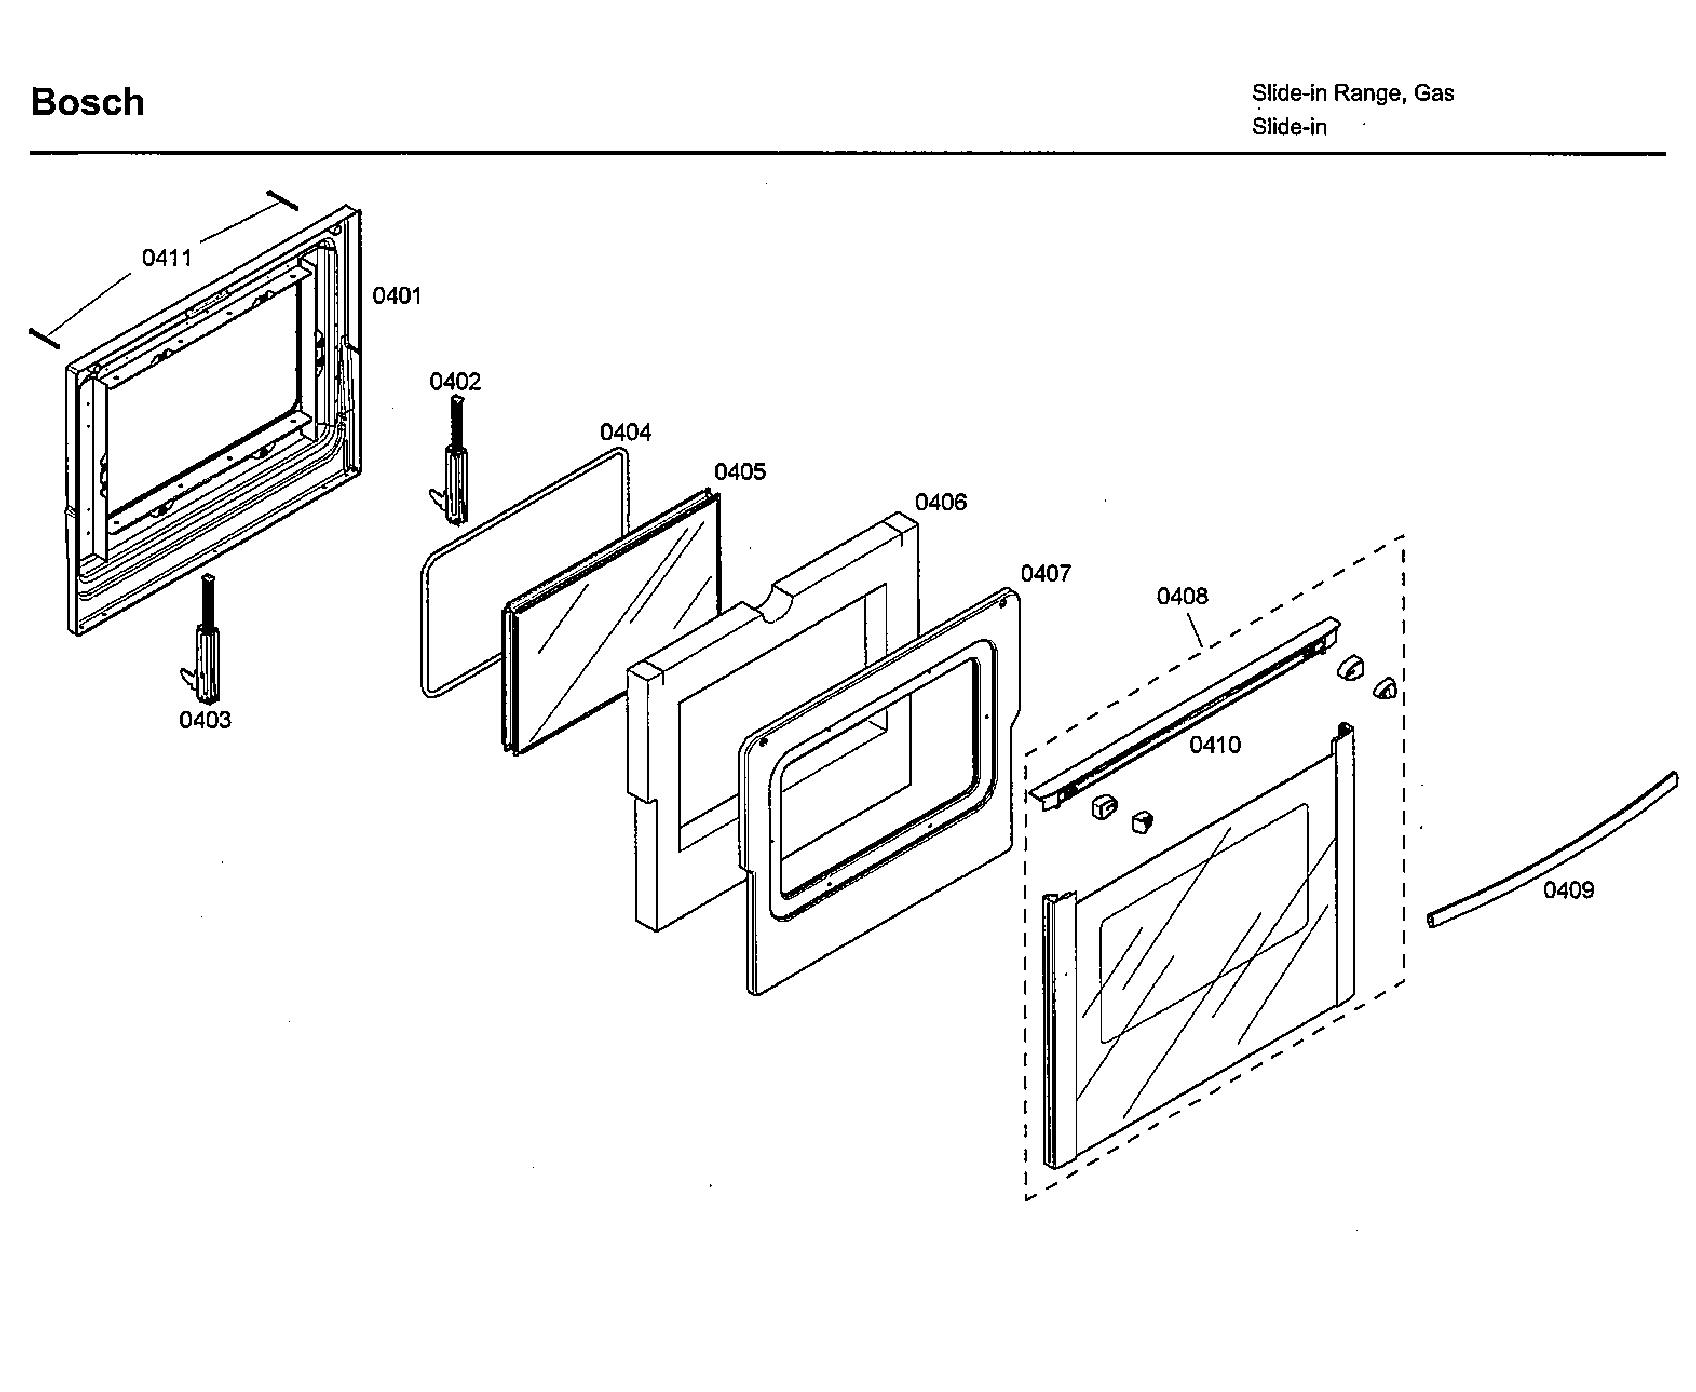 Bosch model HDI7282U/03 slide-in range, electric/gas